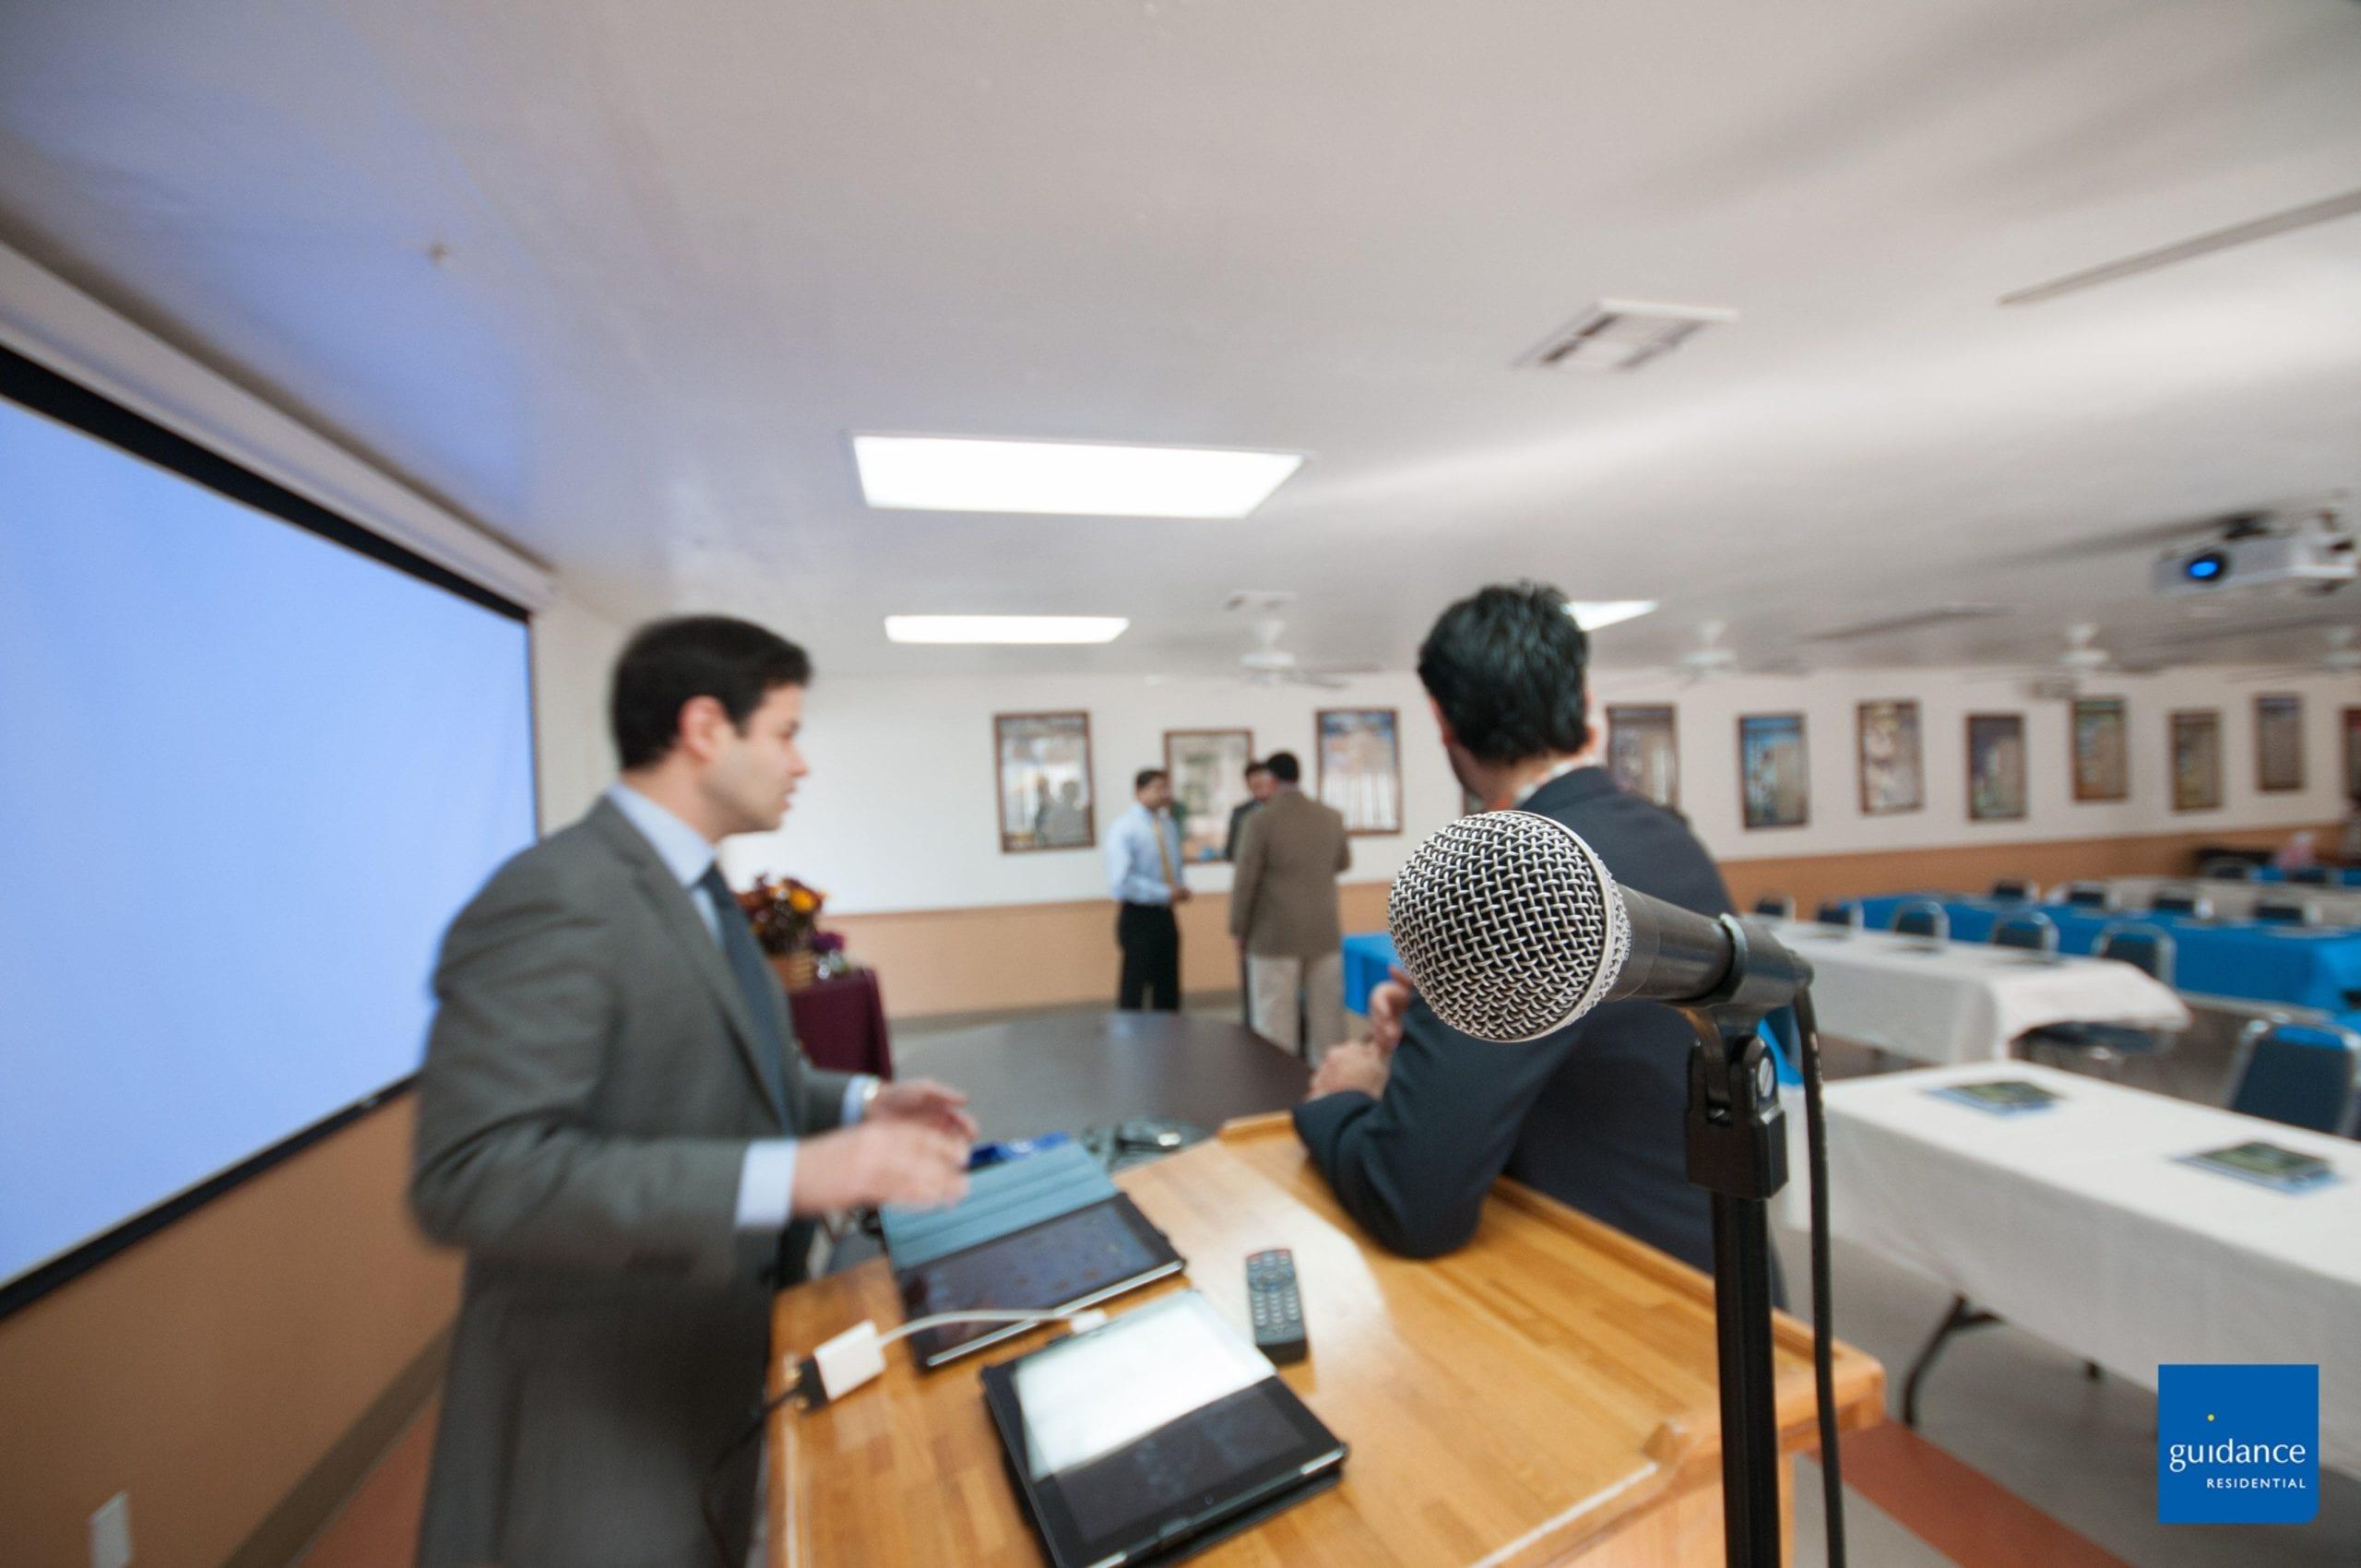 Shaykh Yusuf DeLorenzo - California - Guidance Residential 17